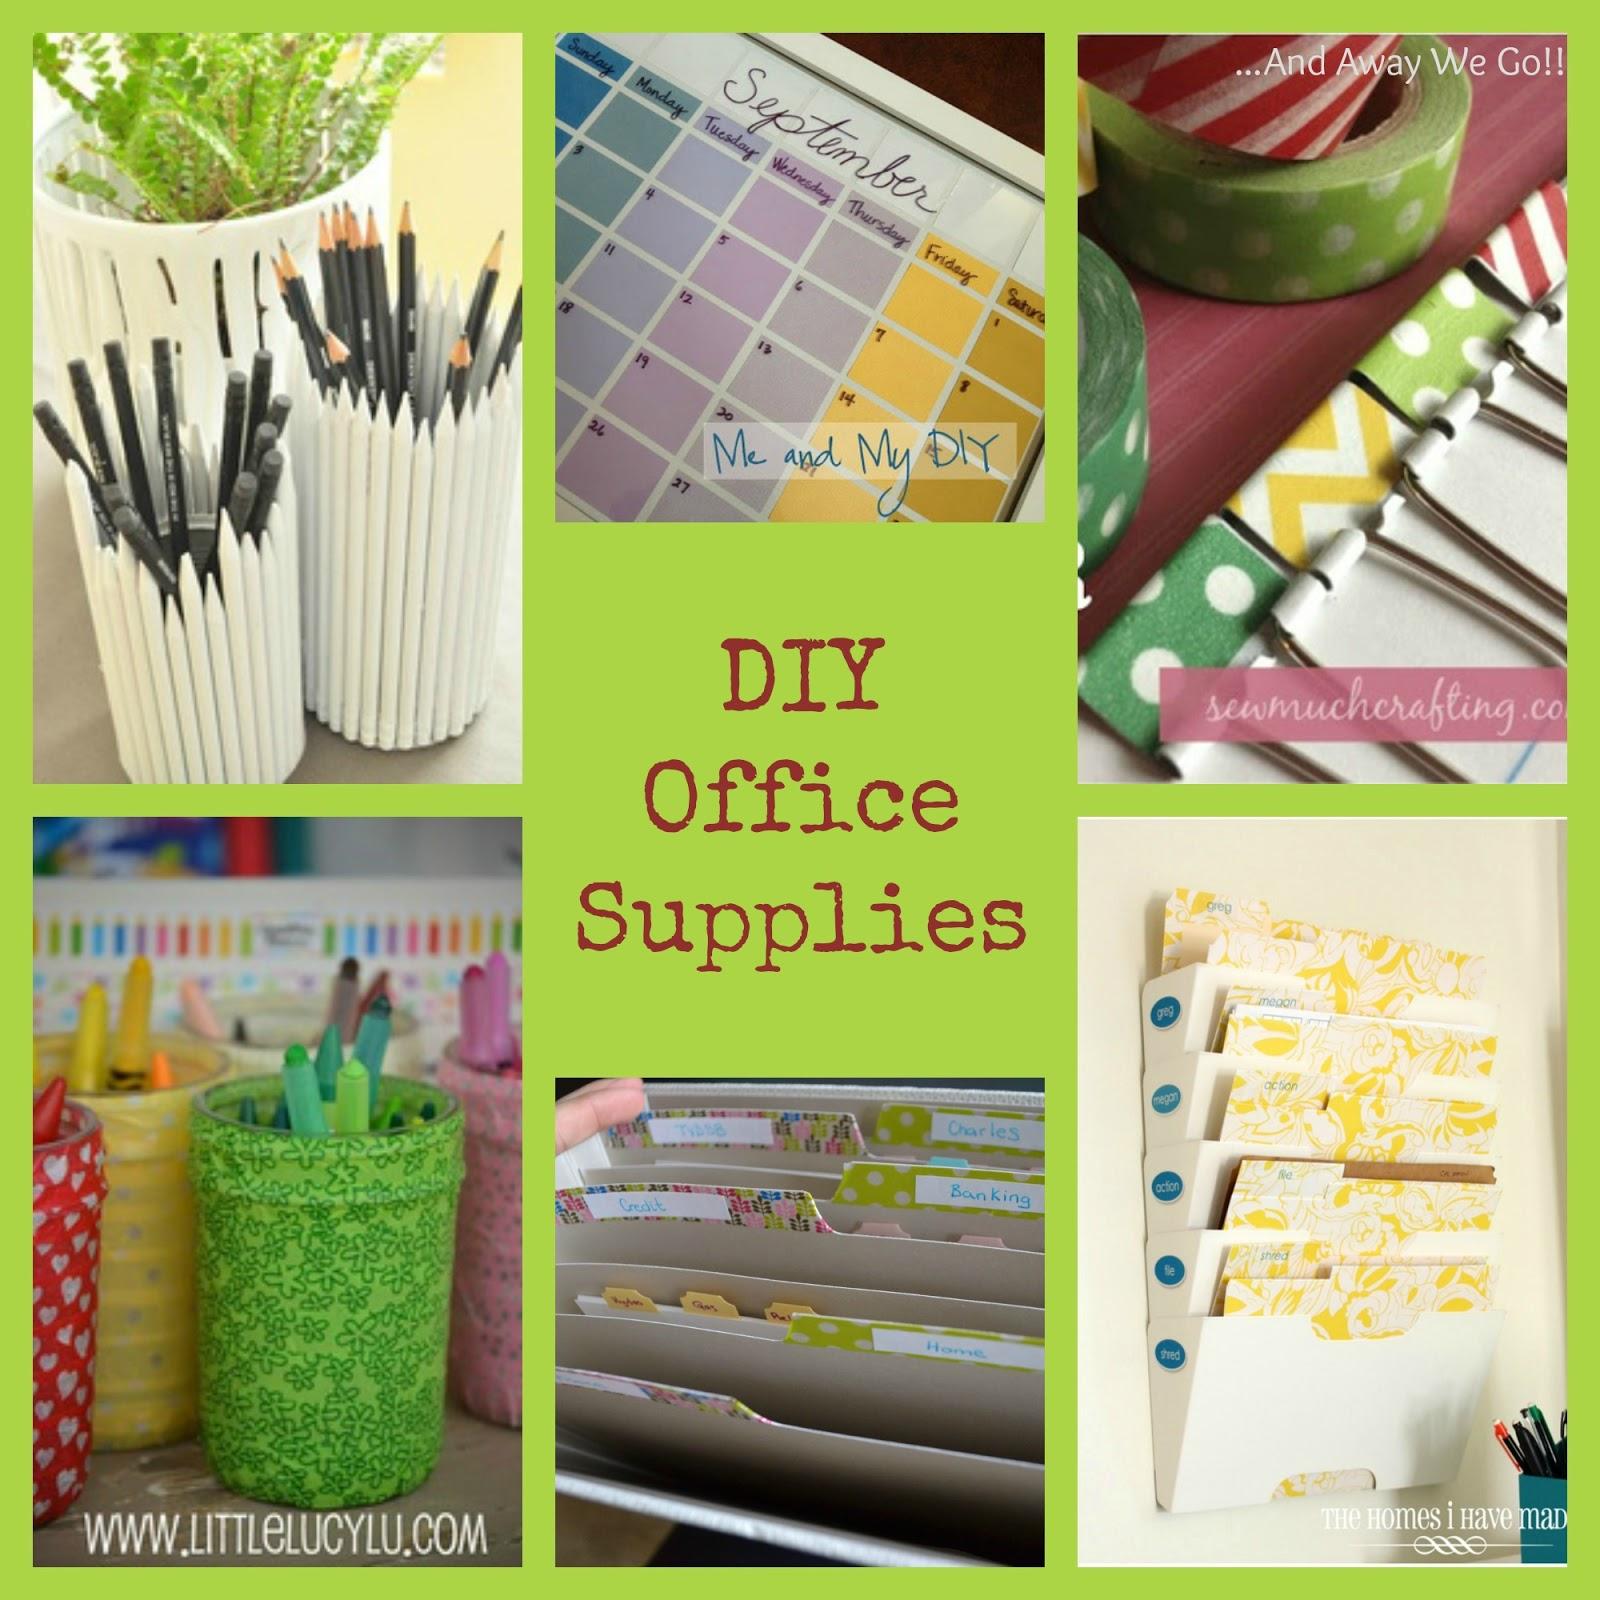 diy office supplies. Office Supply DIY Diy Supplies F